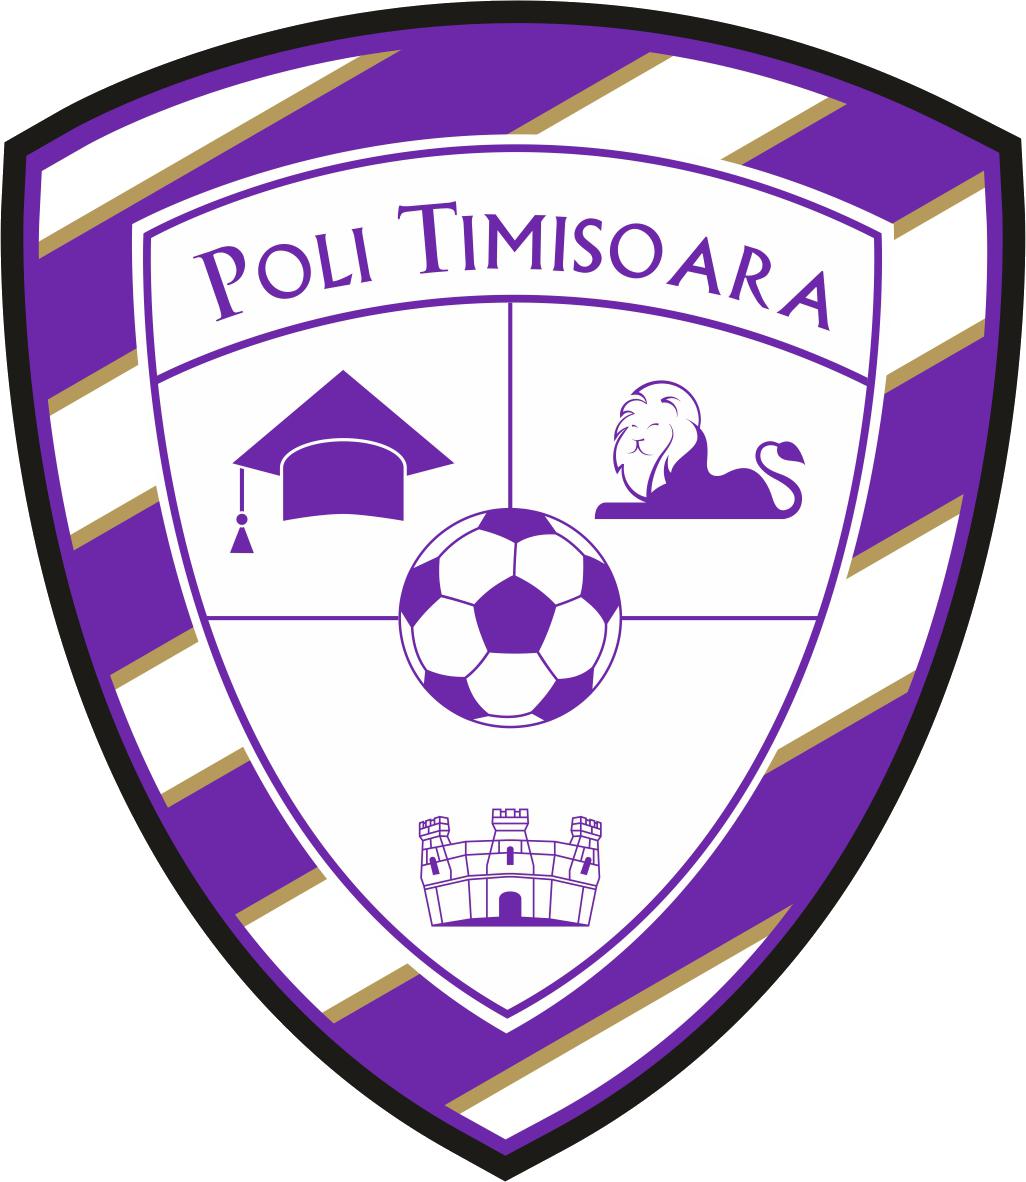 Poli Timisoara logo